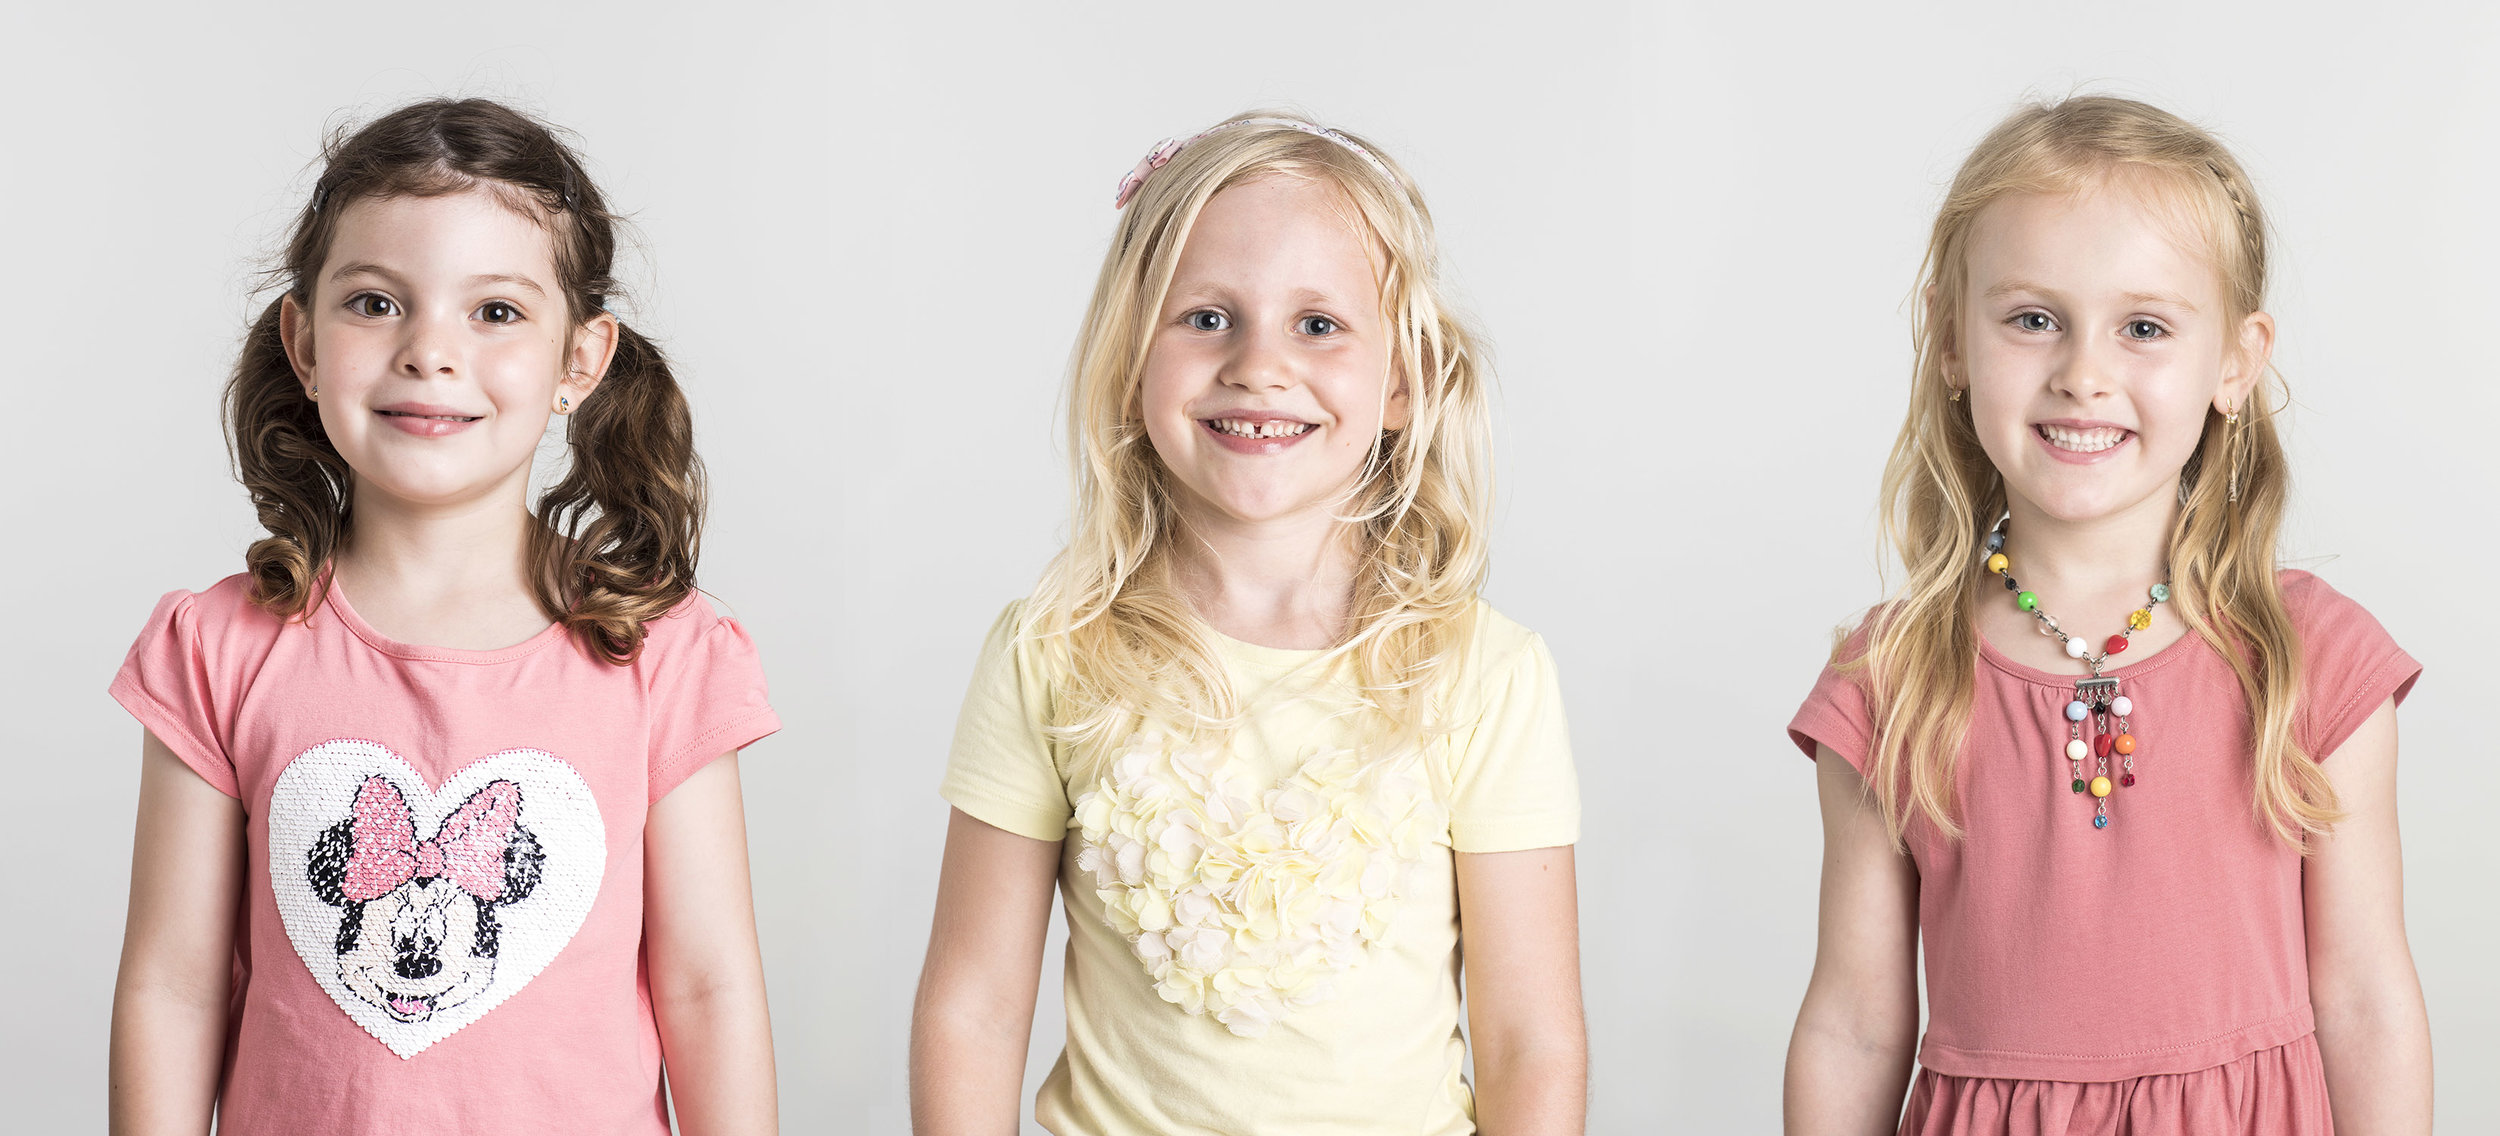 Bild: lauperzemp / Portraits Schulkinder